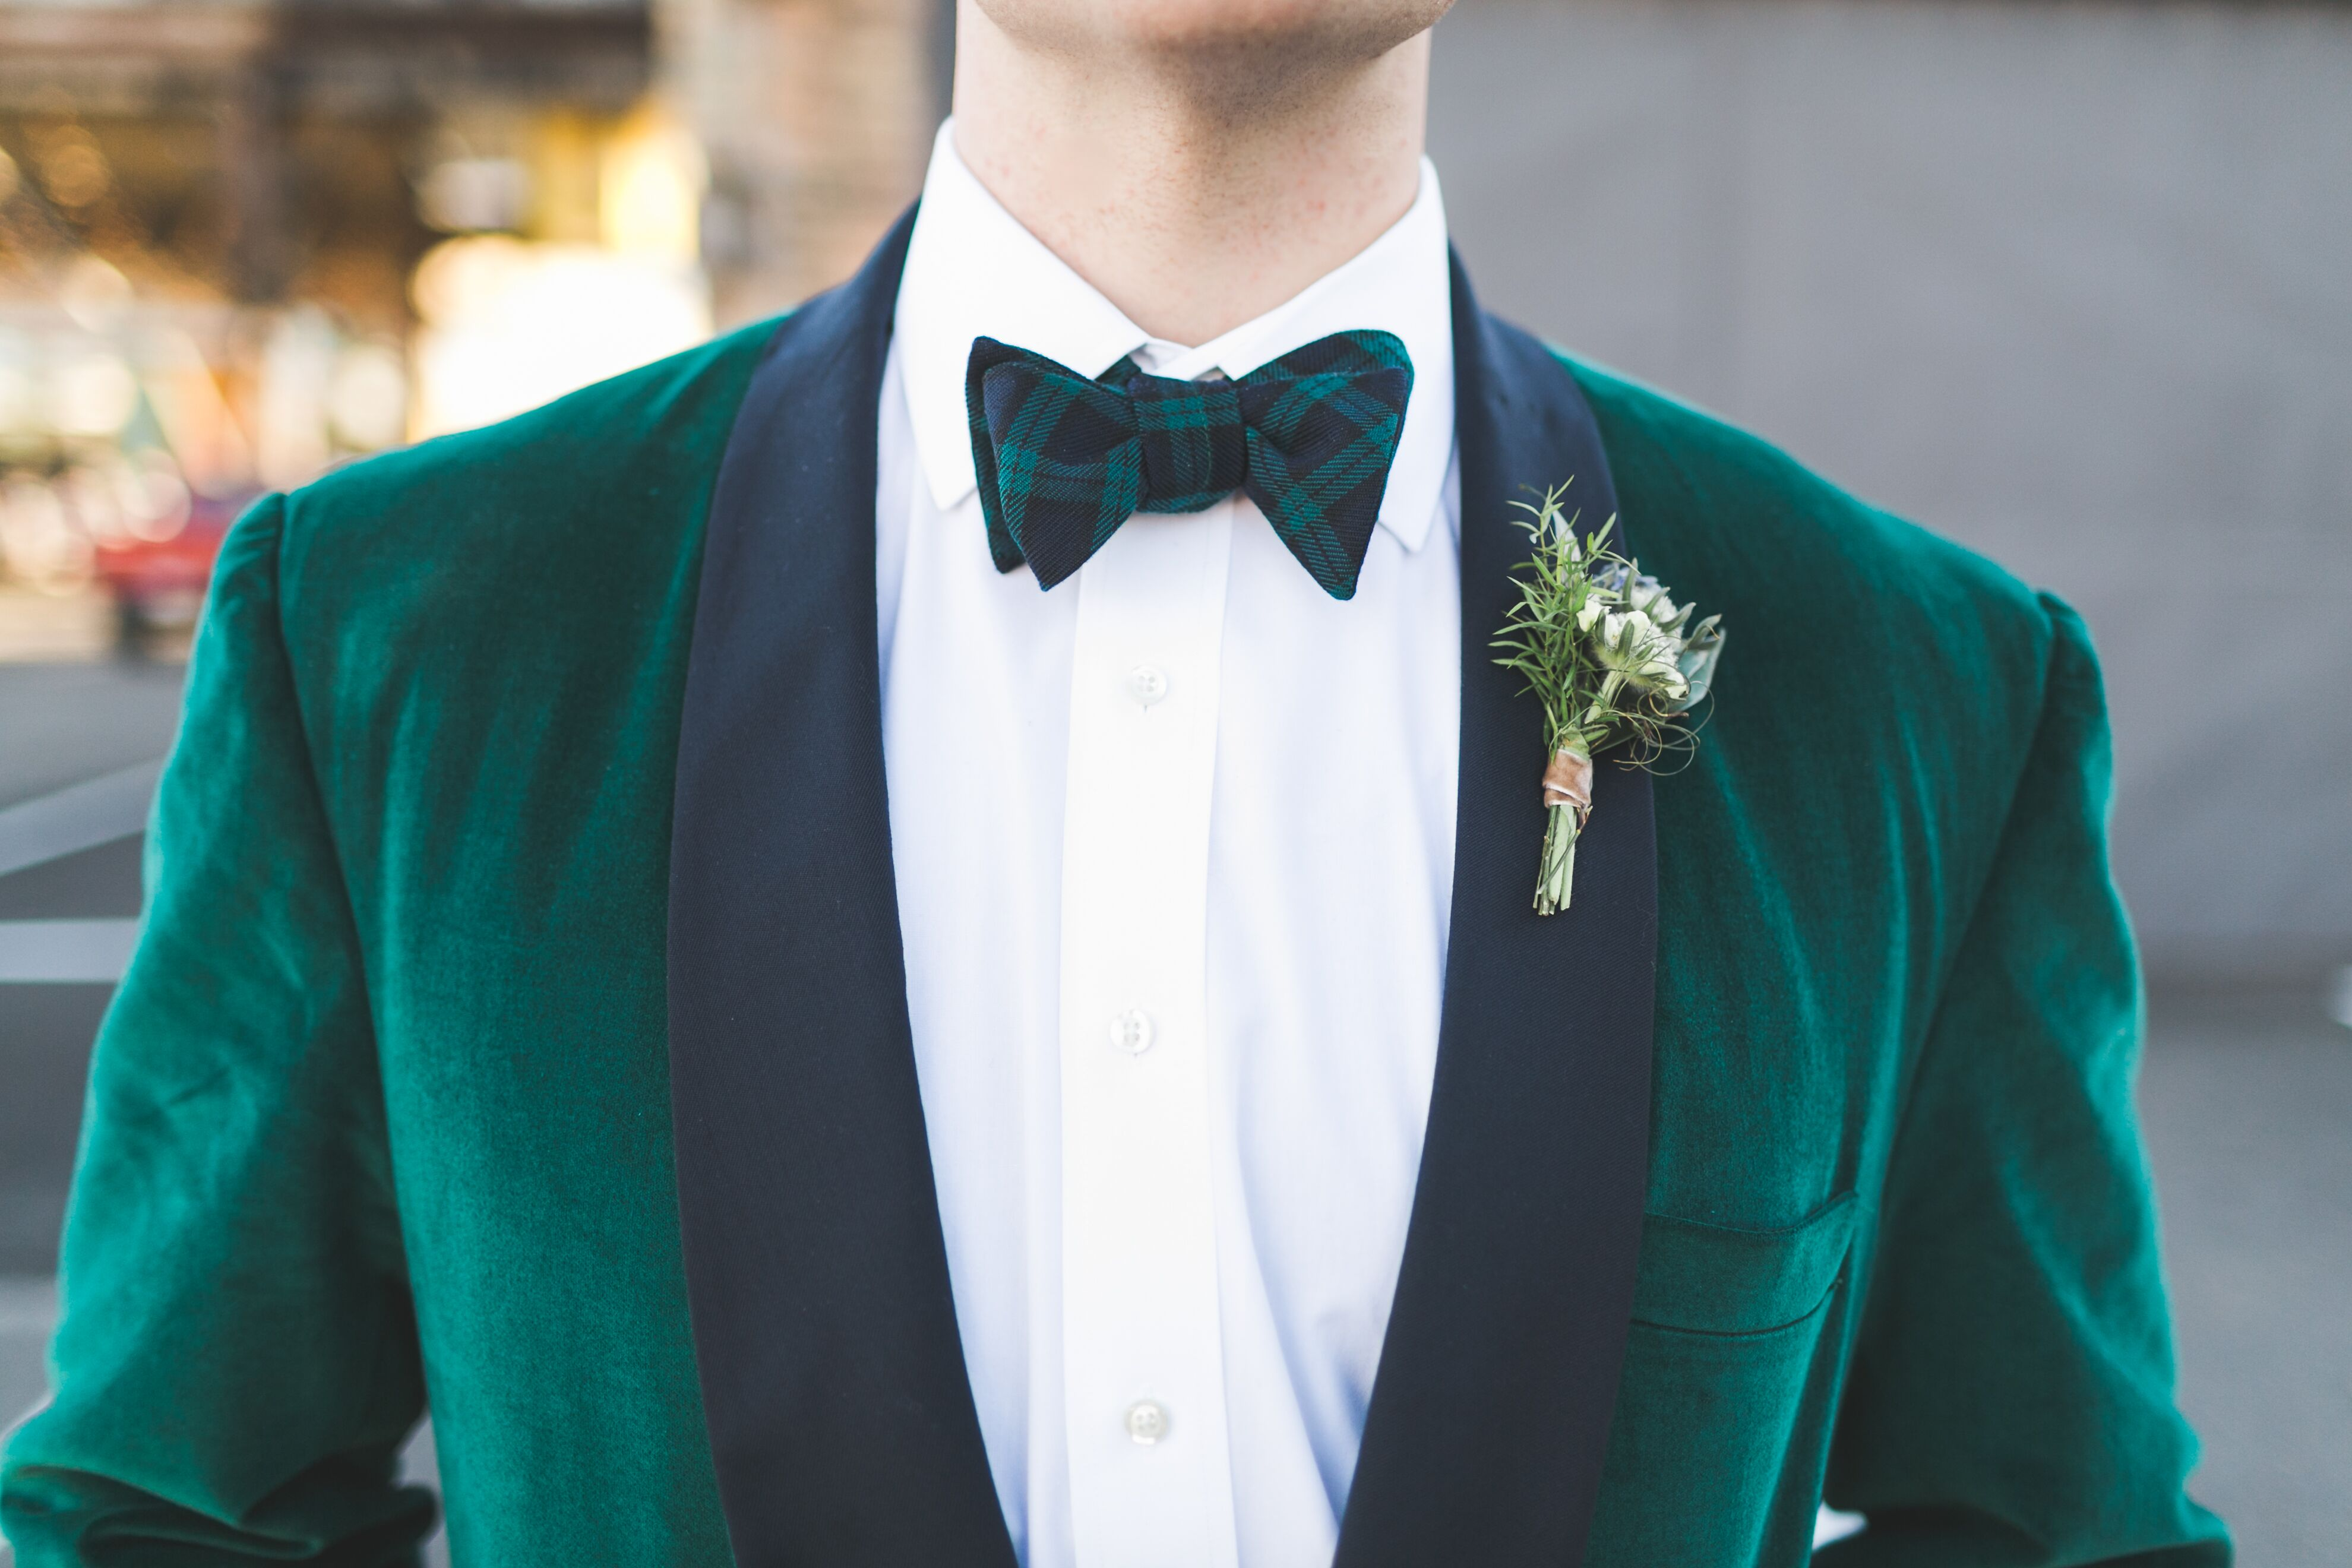 Velvet Emerald Green Groom Tuxedo With Plaid Bow Tie